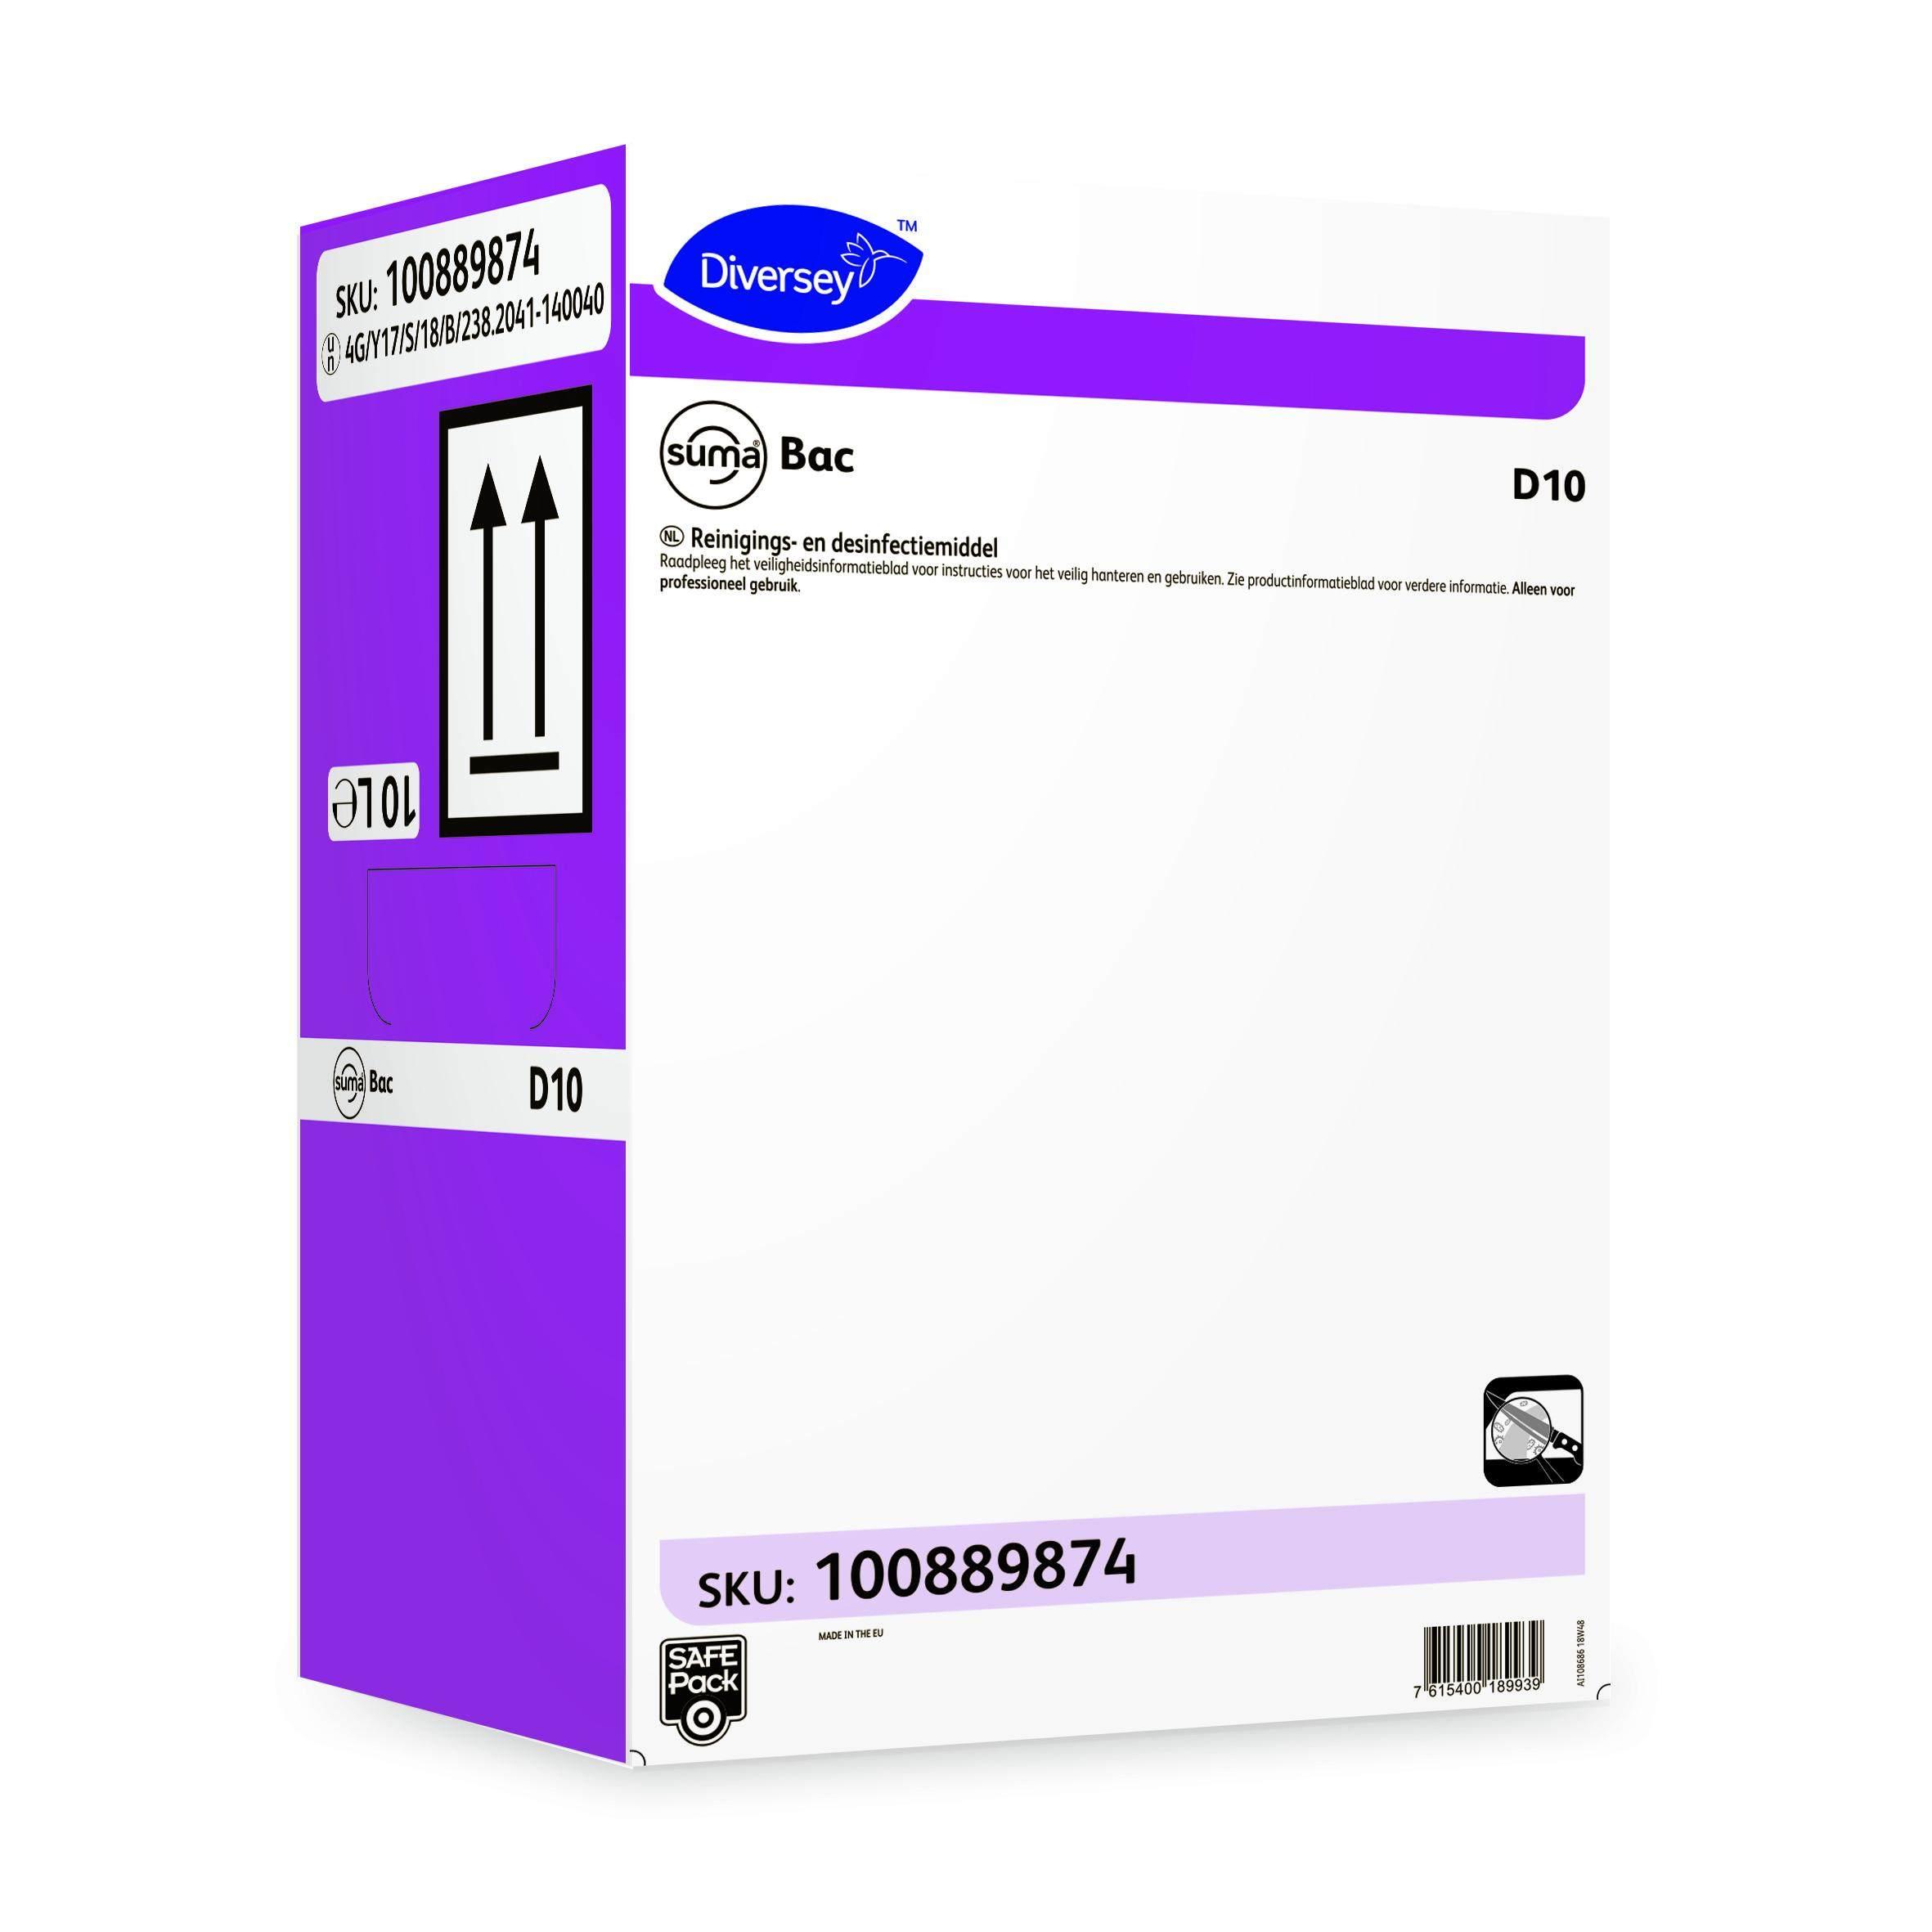 100889874-Suma-Bac-D10-10L-Sp-NL-CMYK-20x20cm.jpg